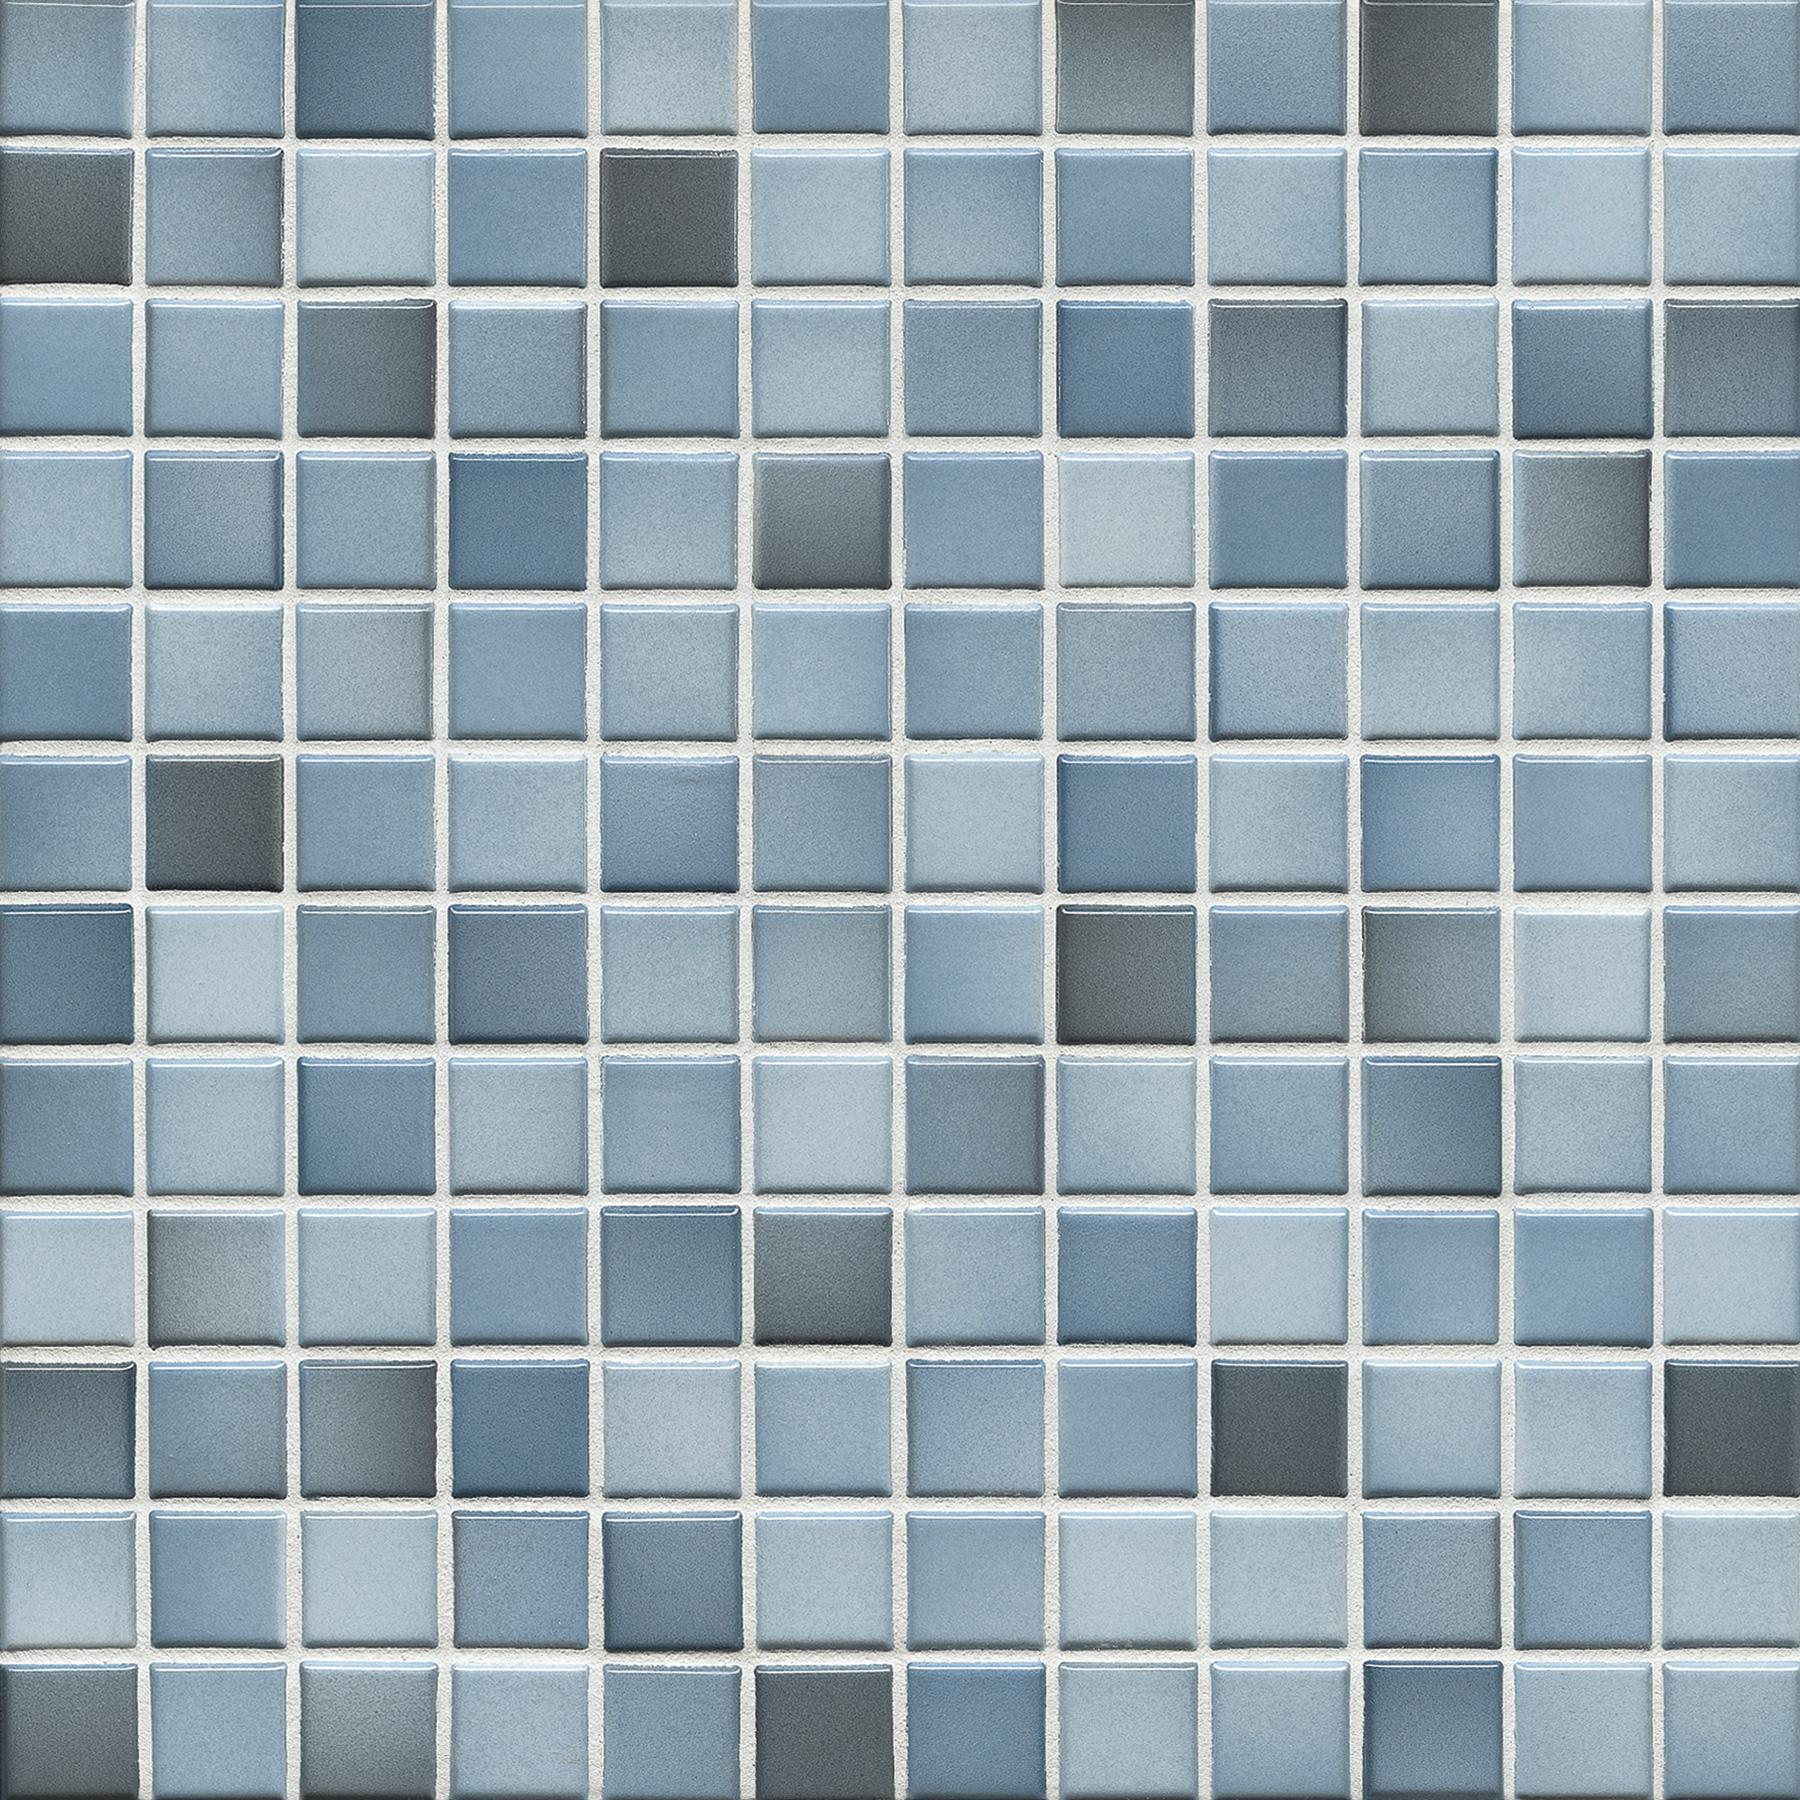 Jasba FRESH denim blue mix glossy 24x24x6,5 mm 41206H